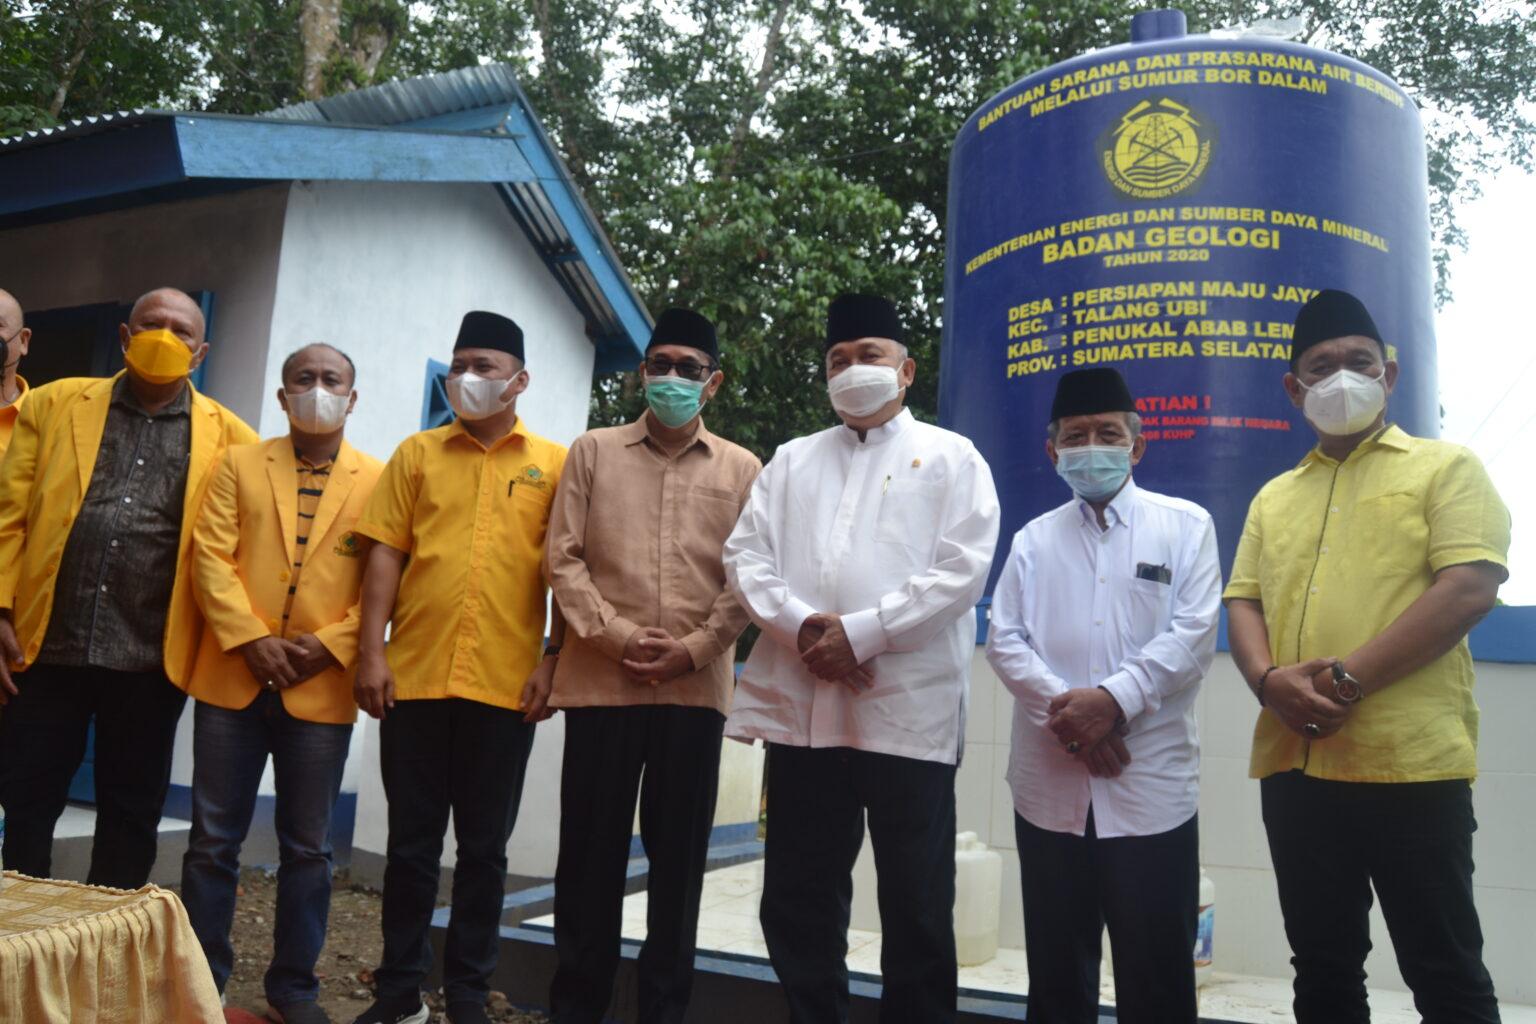 Alex Noerdin Resmikan Sumur Bor Untuk Warga Persiapan Maju Jaya, Talang Ubi, Pali